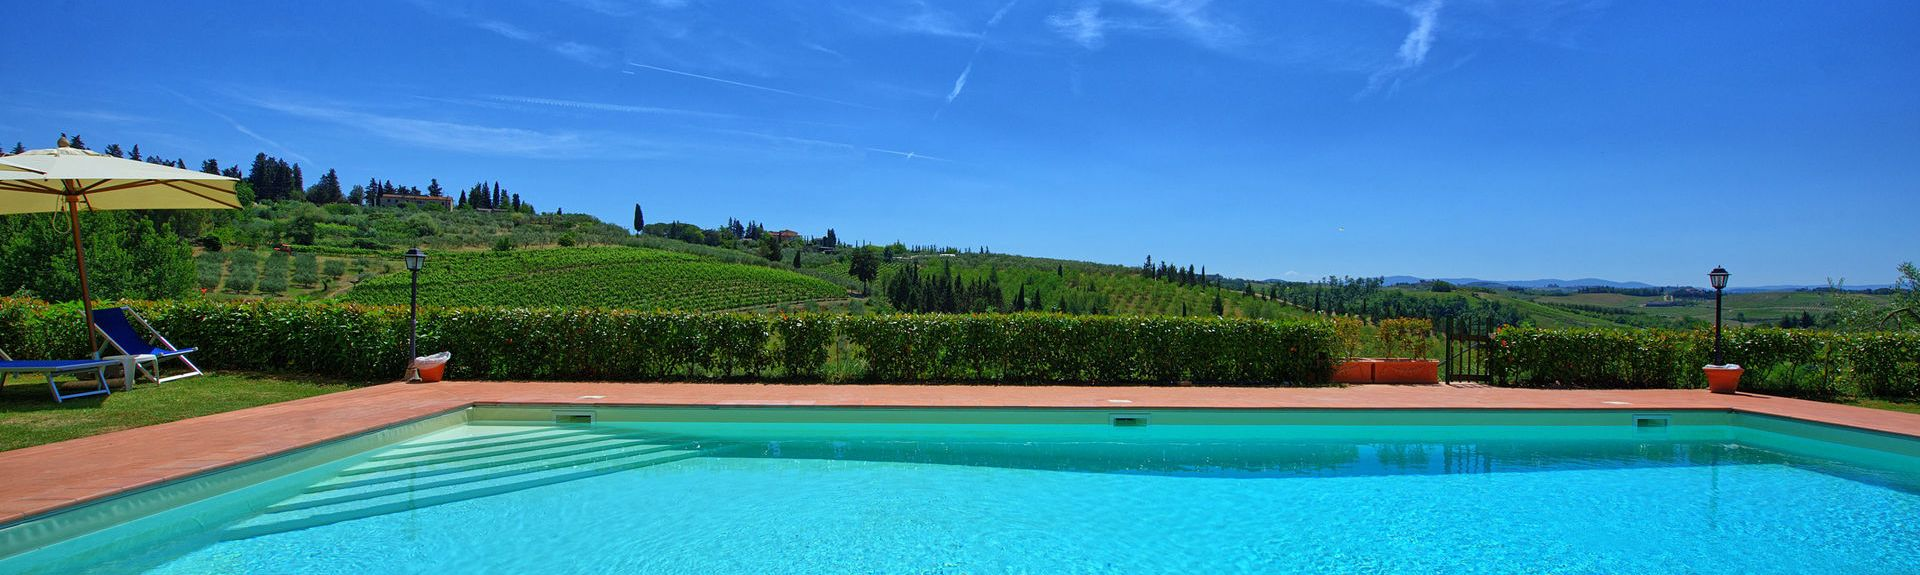 Montelupo Fiorentino, Metropolitan City of Florence, Tuscany, Italy